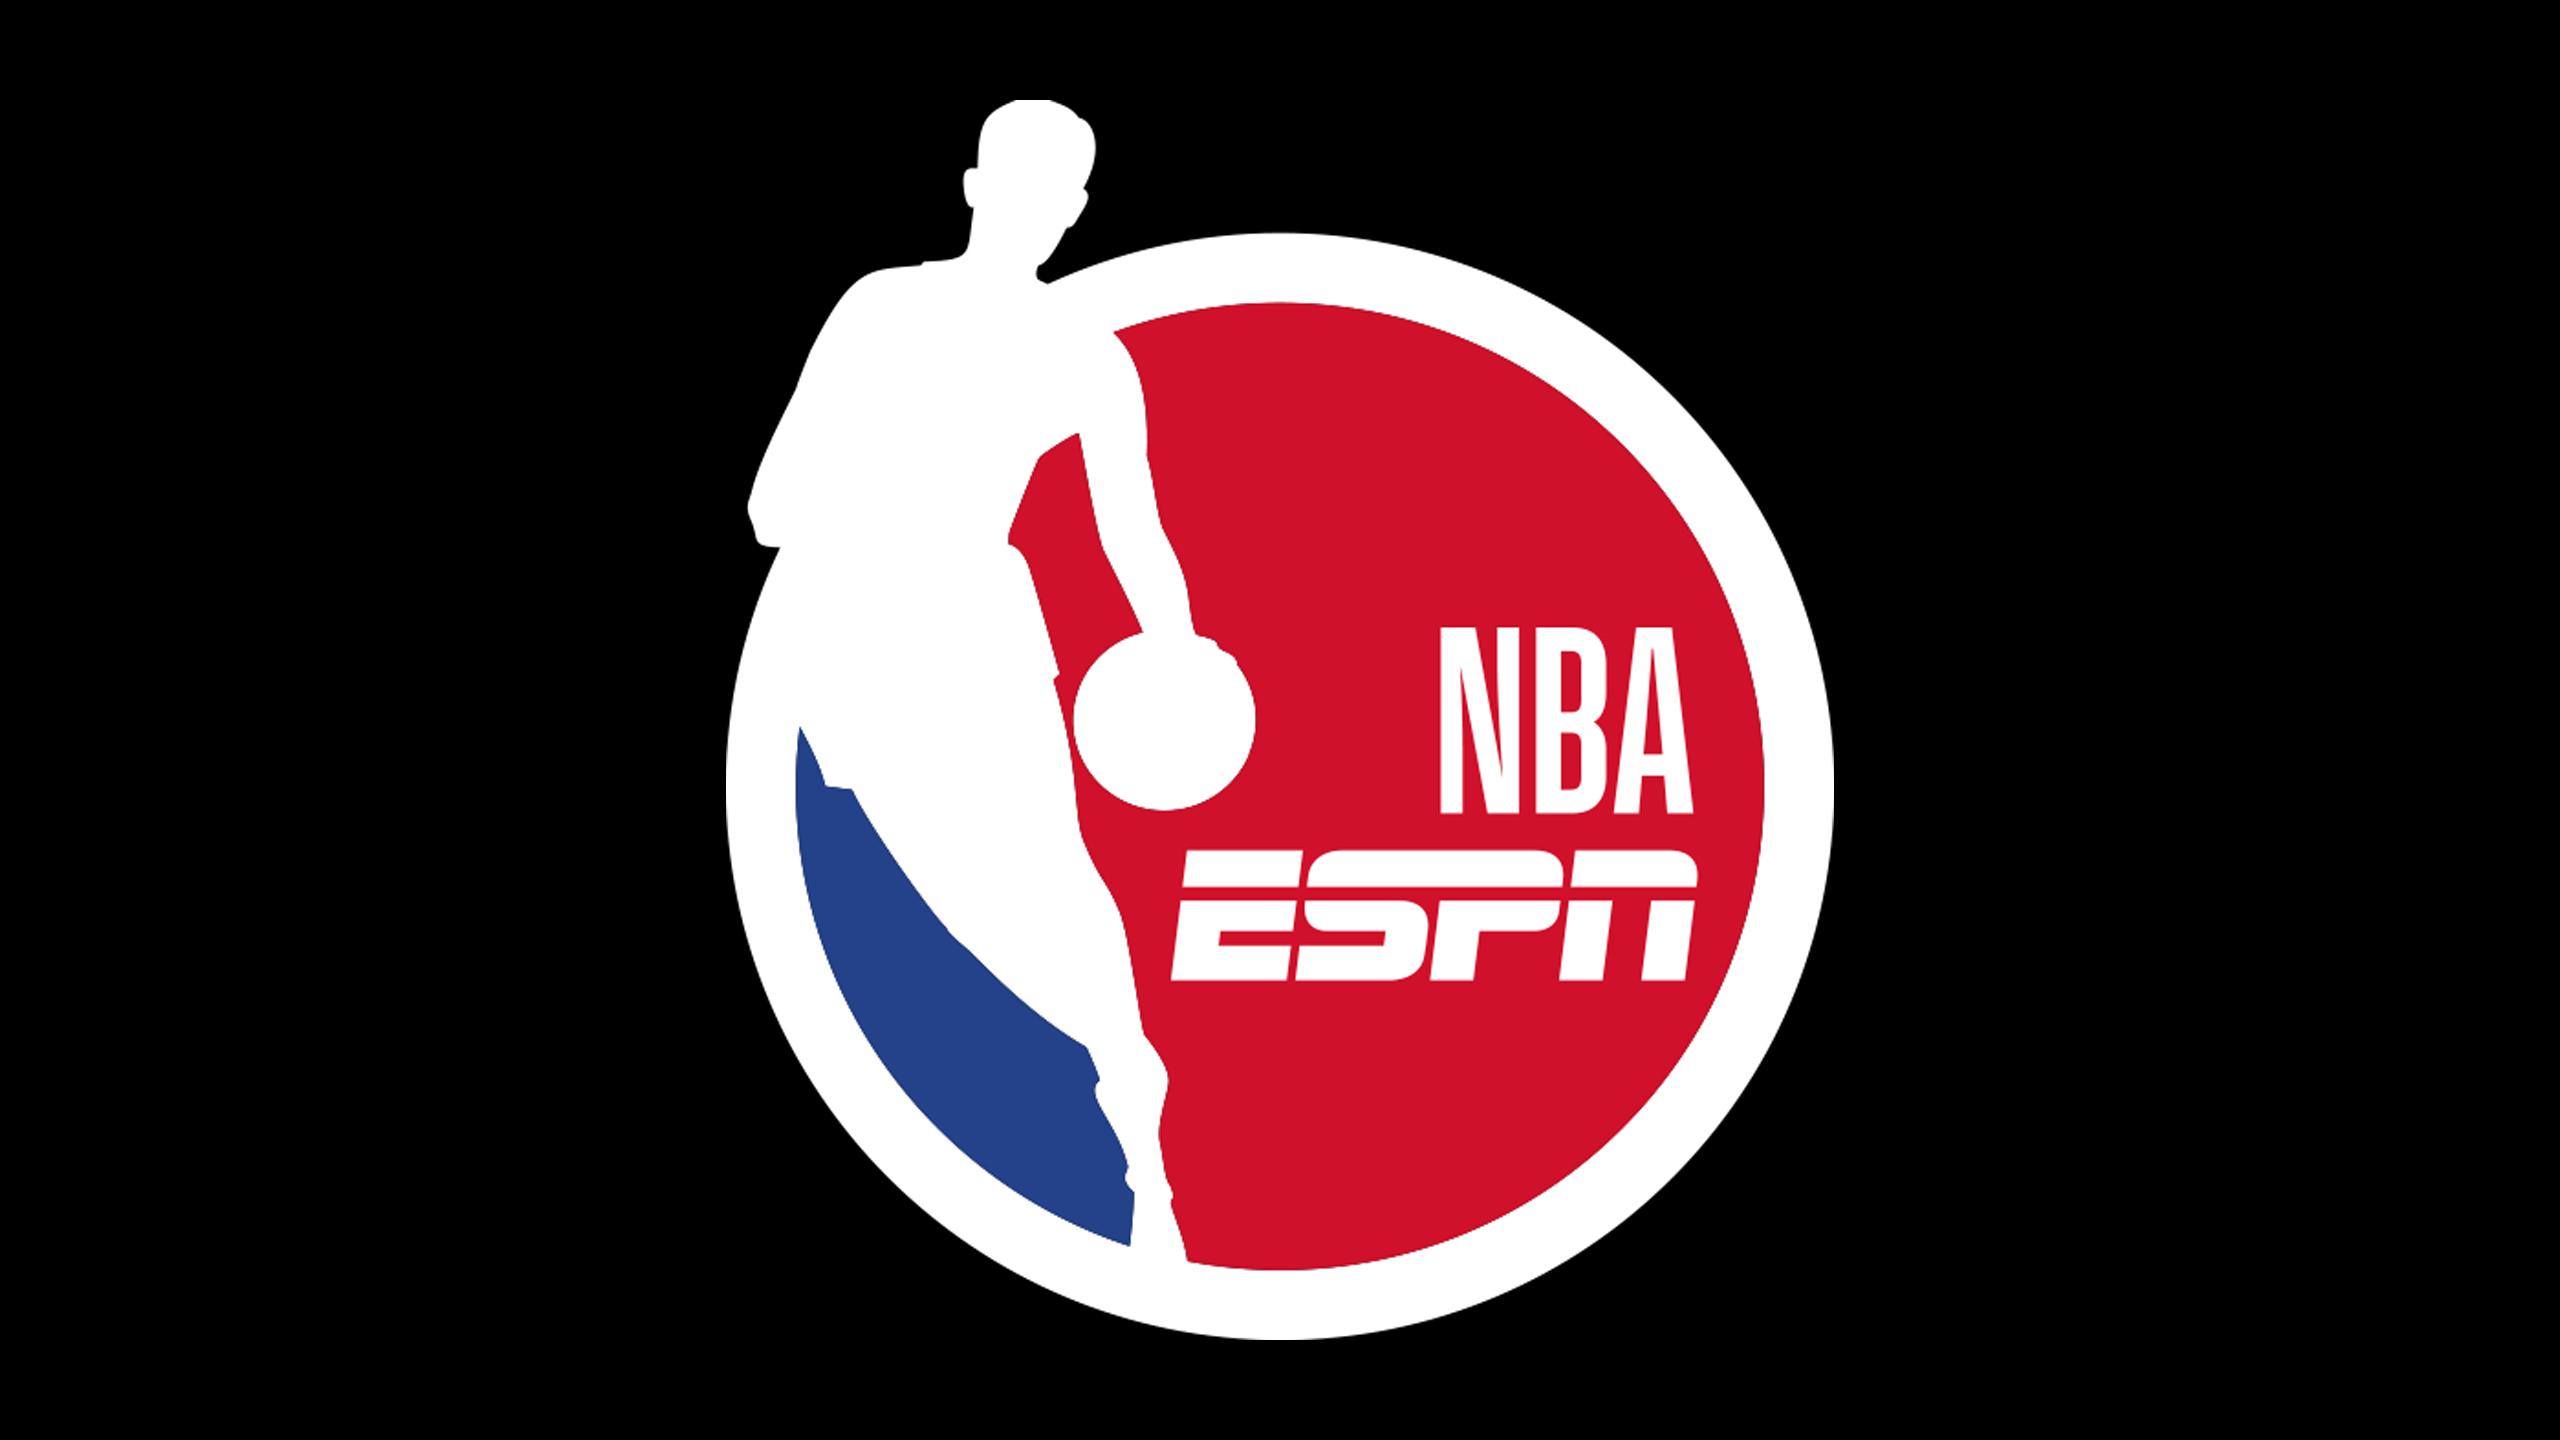 Layup Lines - Oklahoma City Thunder vs. Philadelphia 76ers